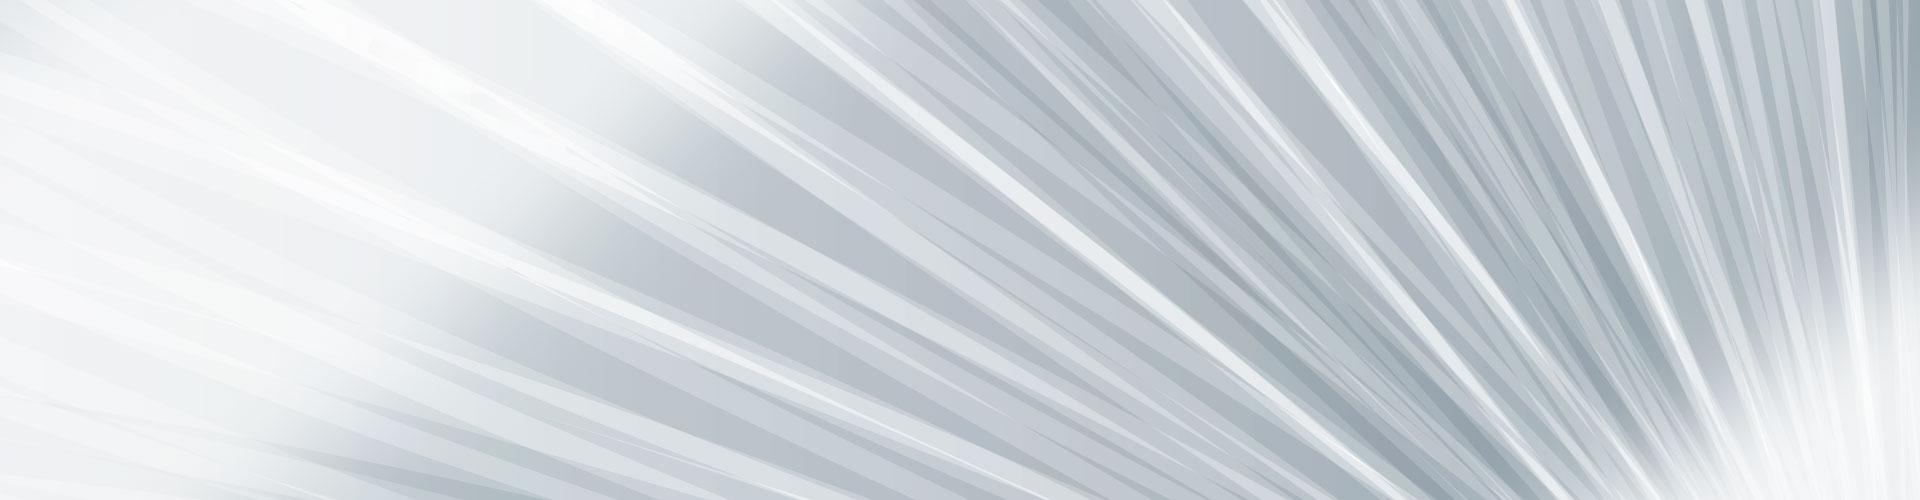 rays-background